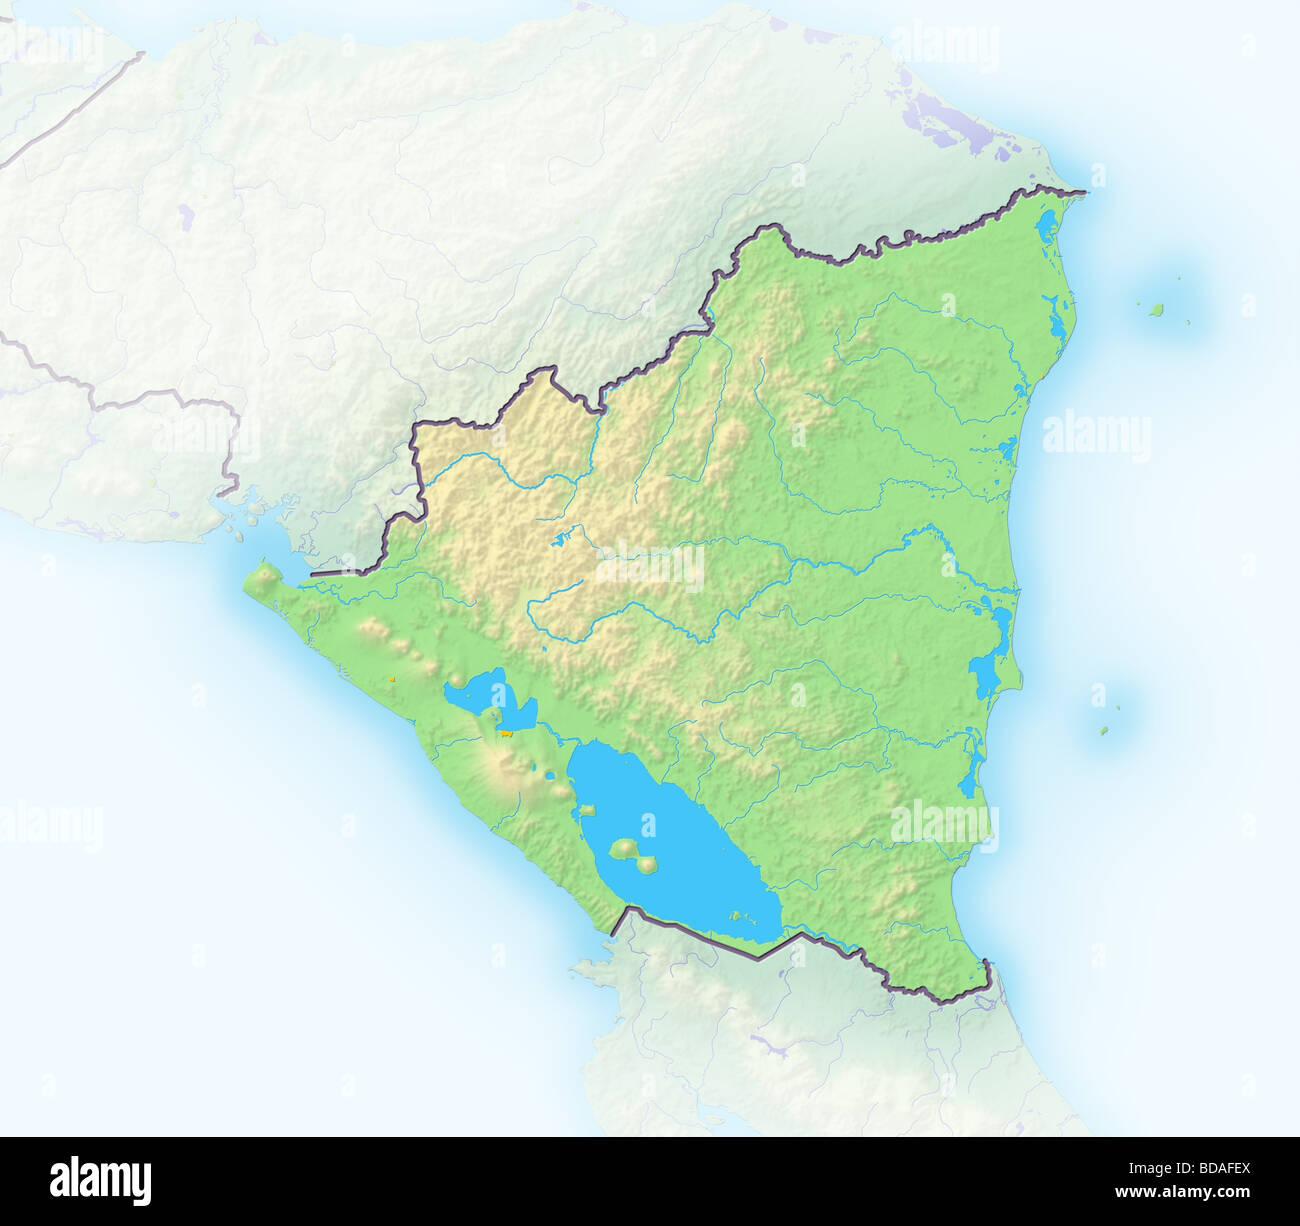 Nicaragua map stock photos nicaragua map stock images alamy nicaragua shaded relief map stock image gumiabroncs Gallery